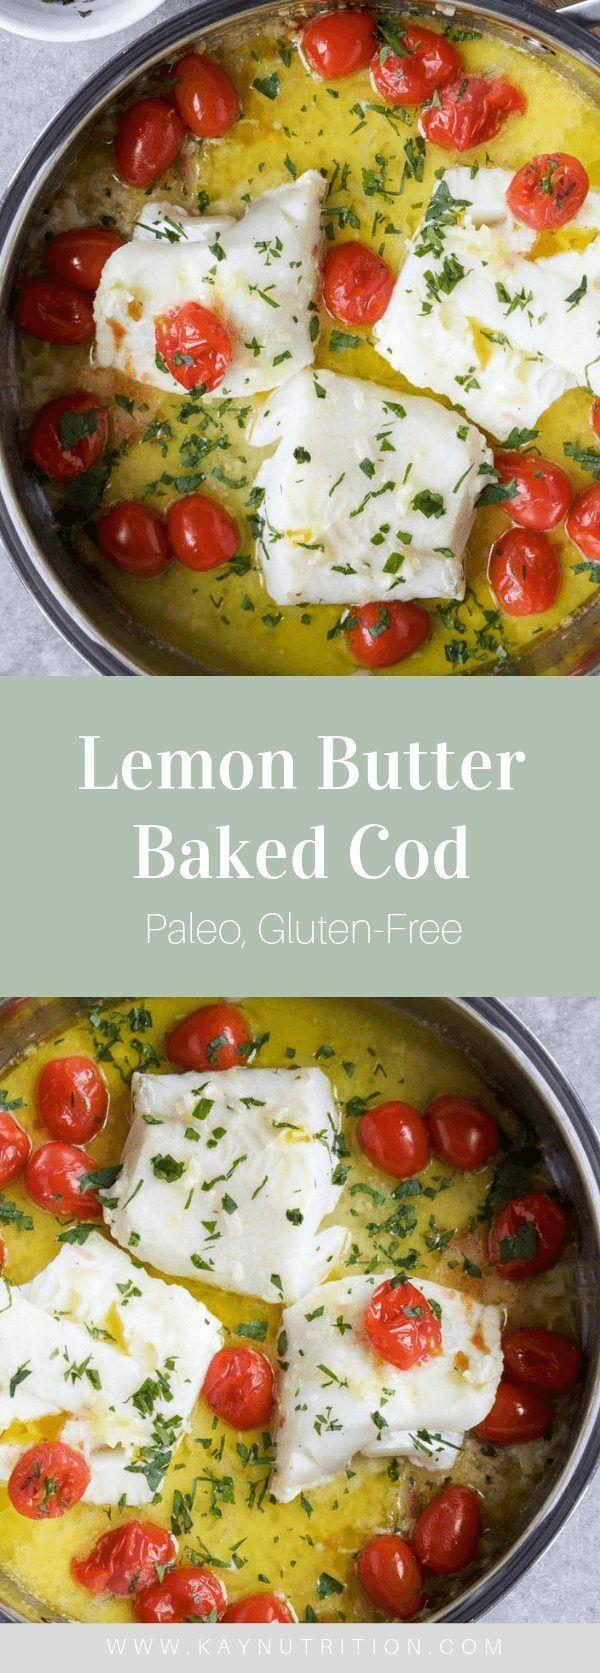 Lemon Butter Baked Cod #cod #fish #seafood #lemon #butter #baked